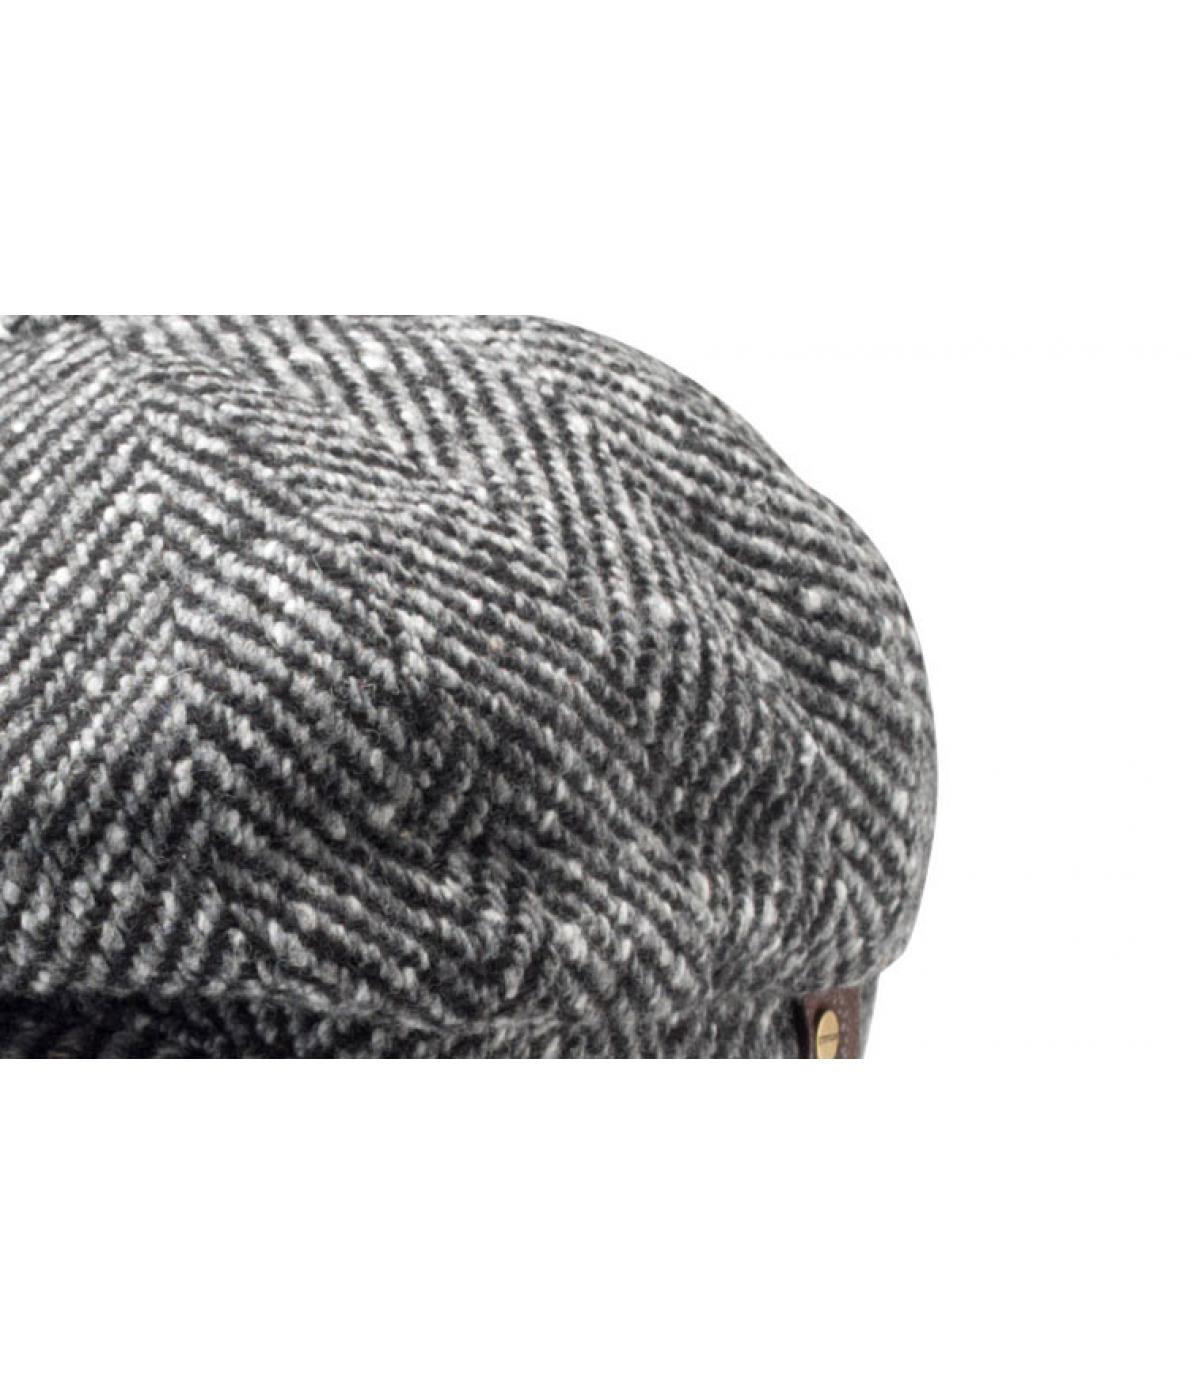 Gorro gris hiver stetson